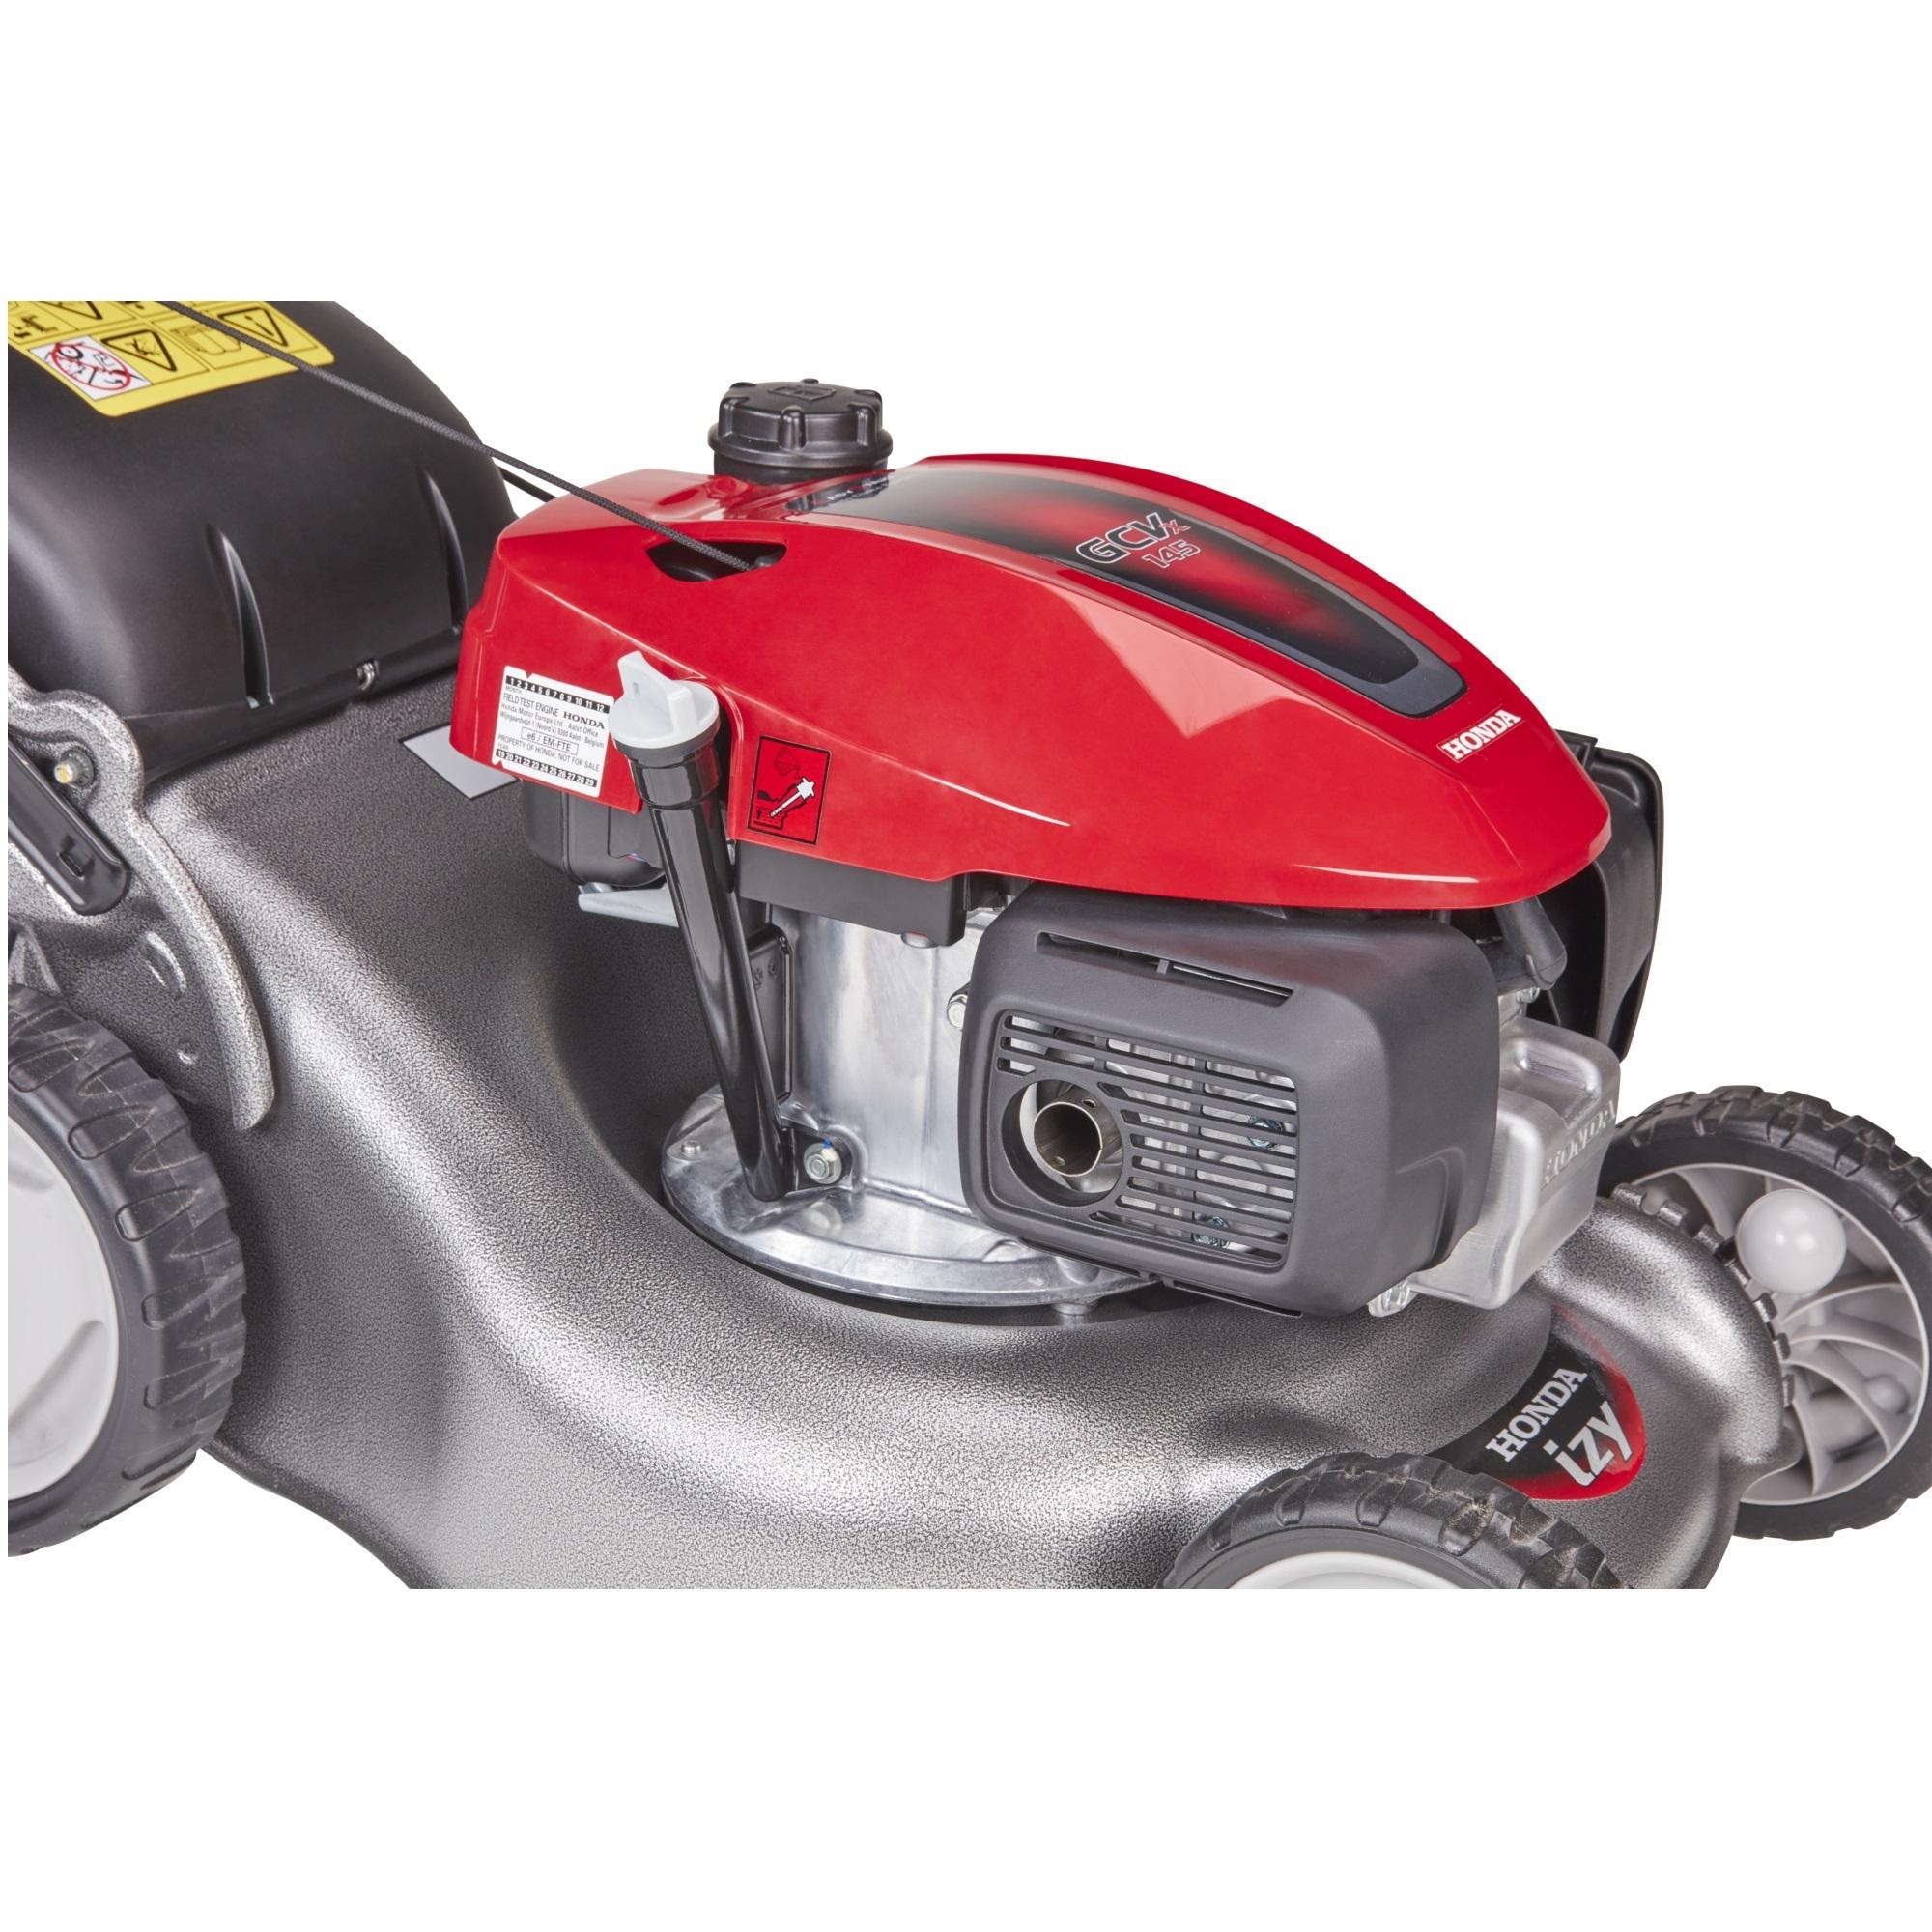 Honda HRG 416 C1 PKEH motorová sekačka bez pojezdu Honda H718857 L-11